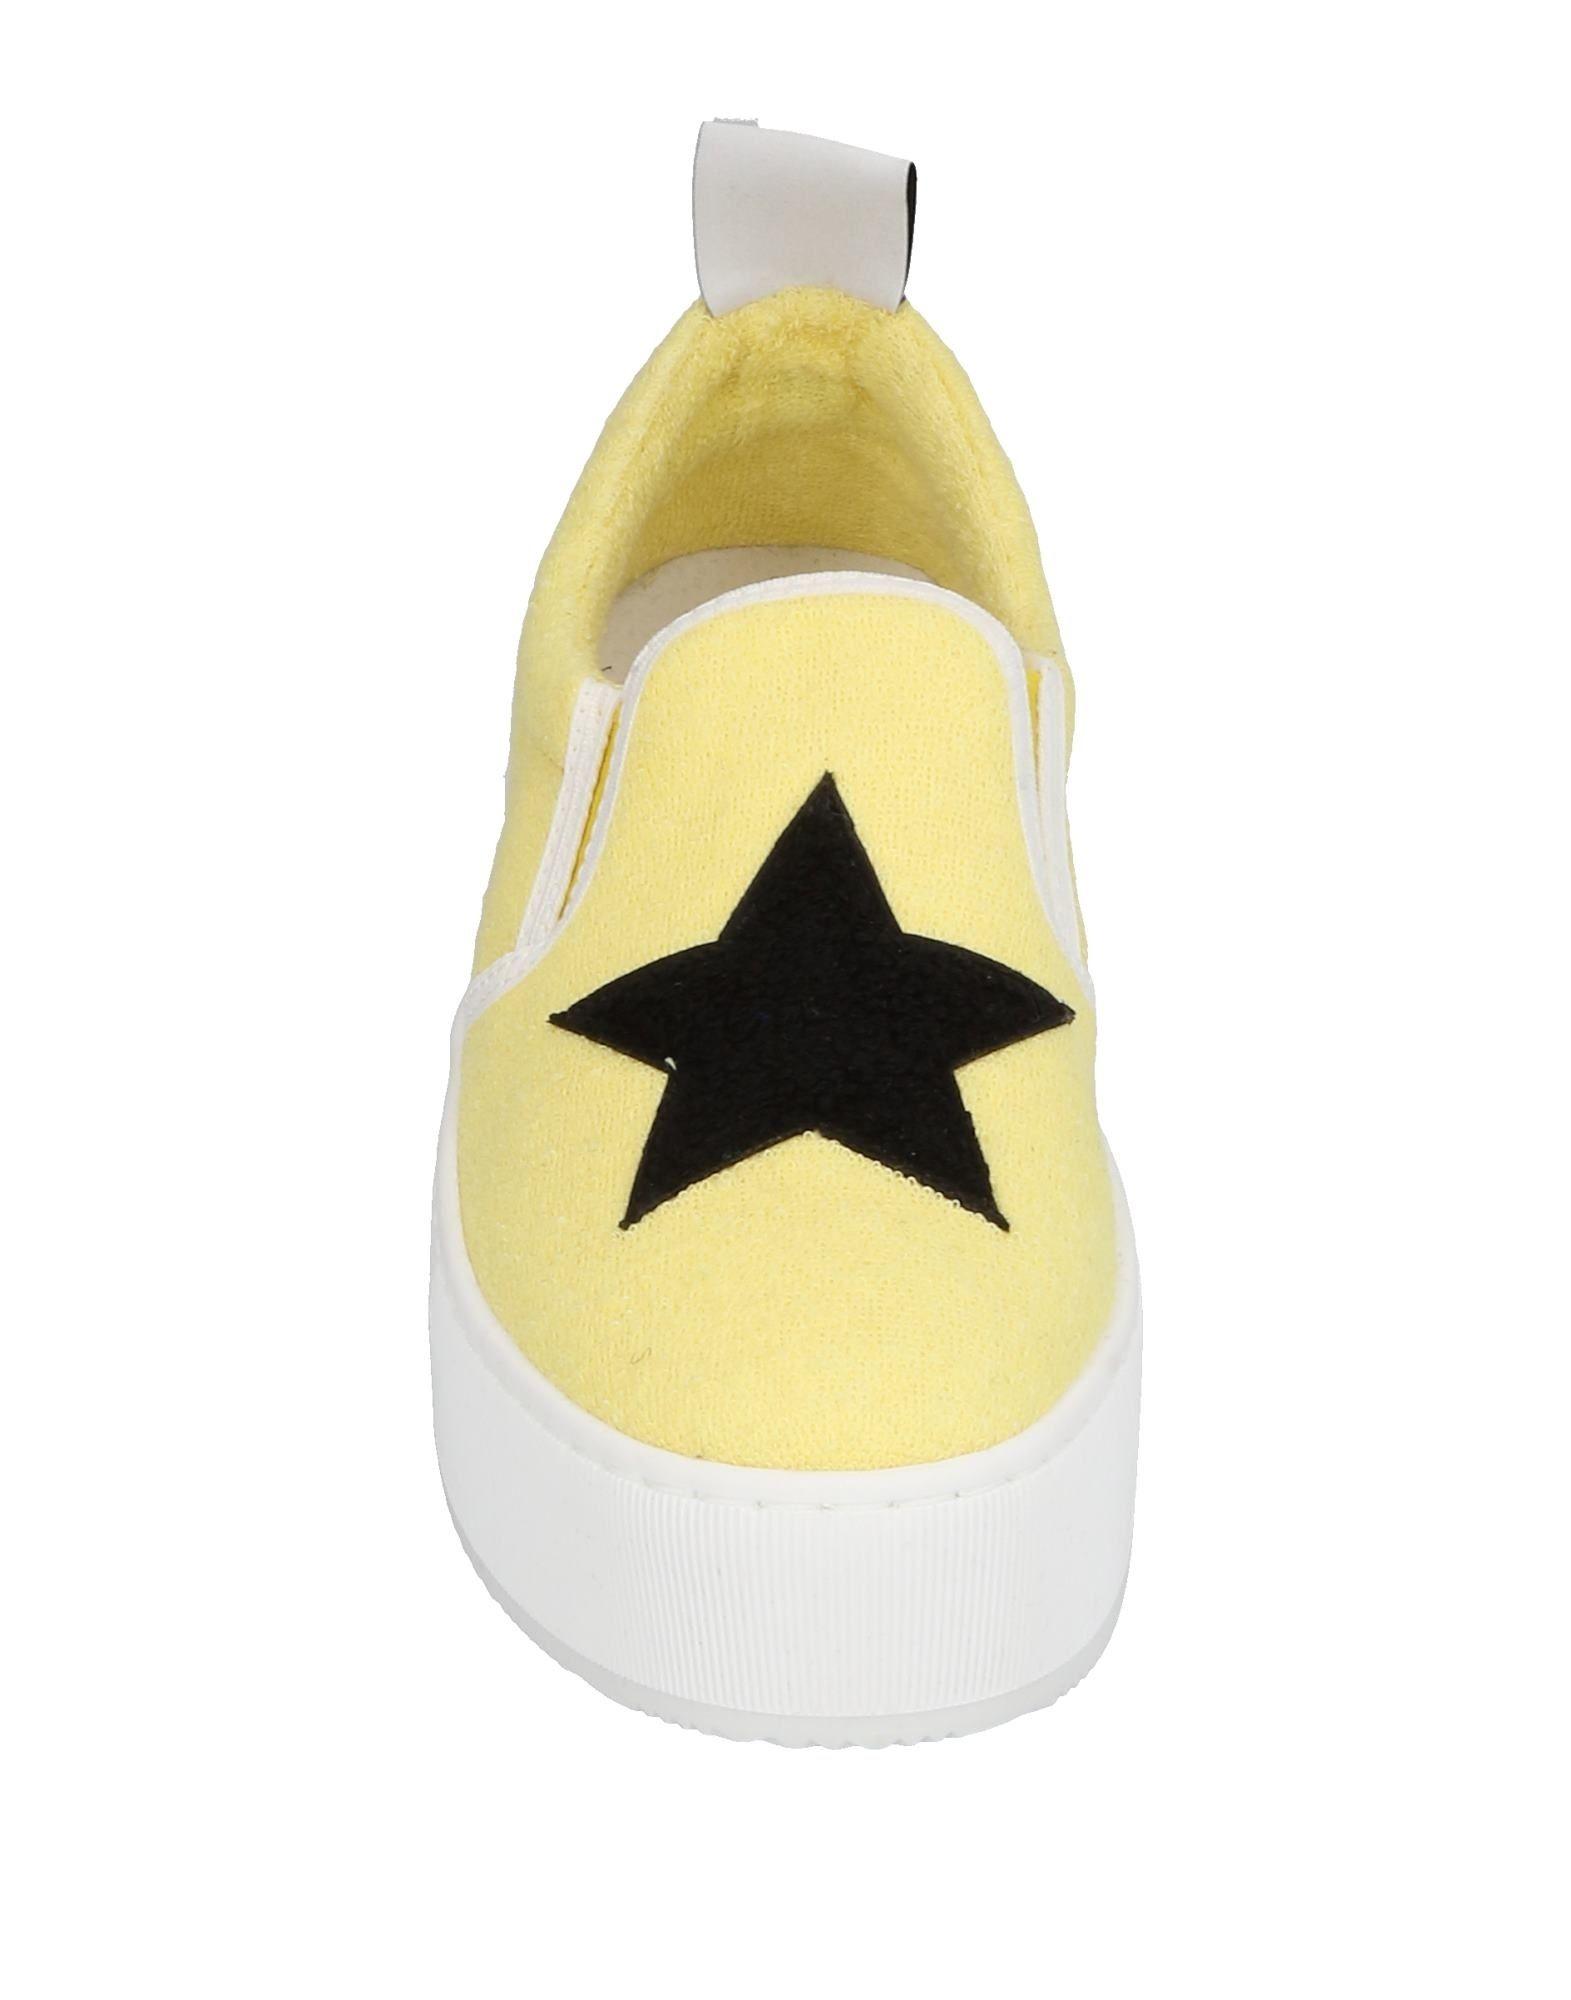 Shop ★ Art Sneakers Damen   Damen 11432918XQ Gute Qualität beliebte Schuhe eea2ea